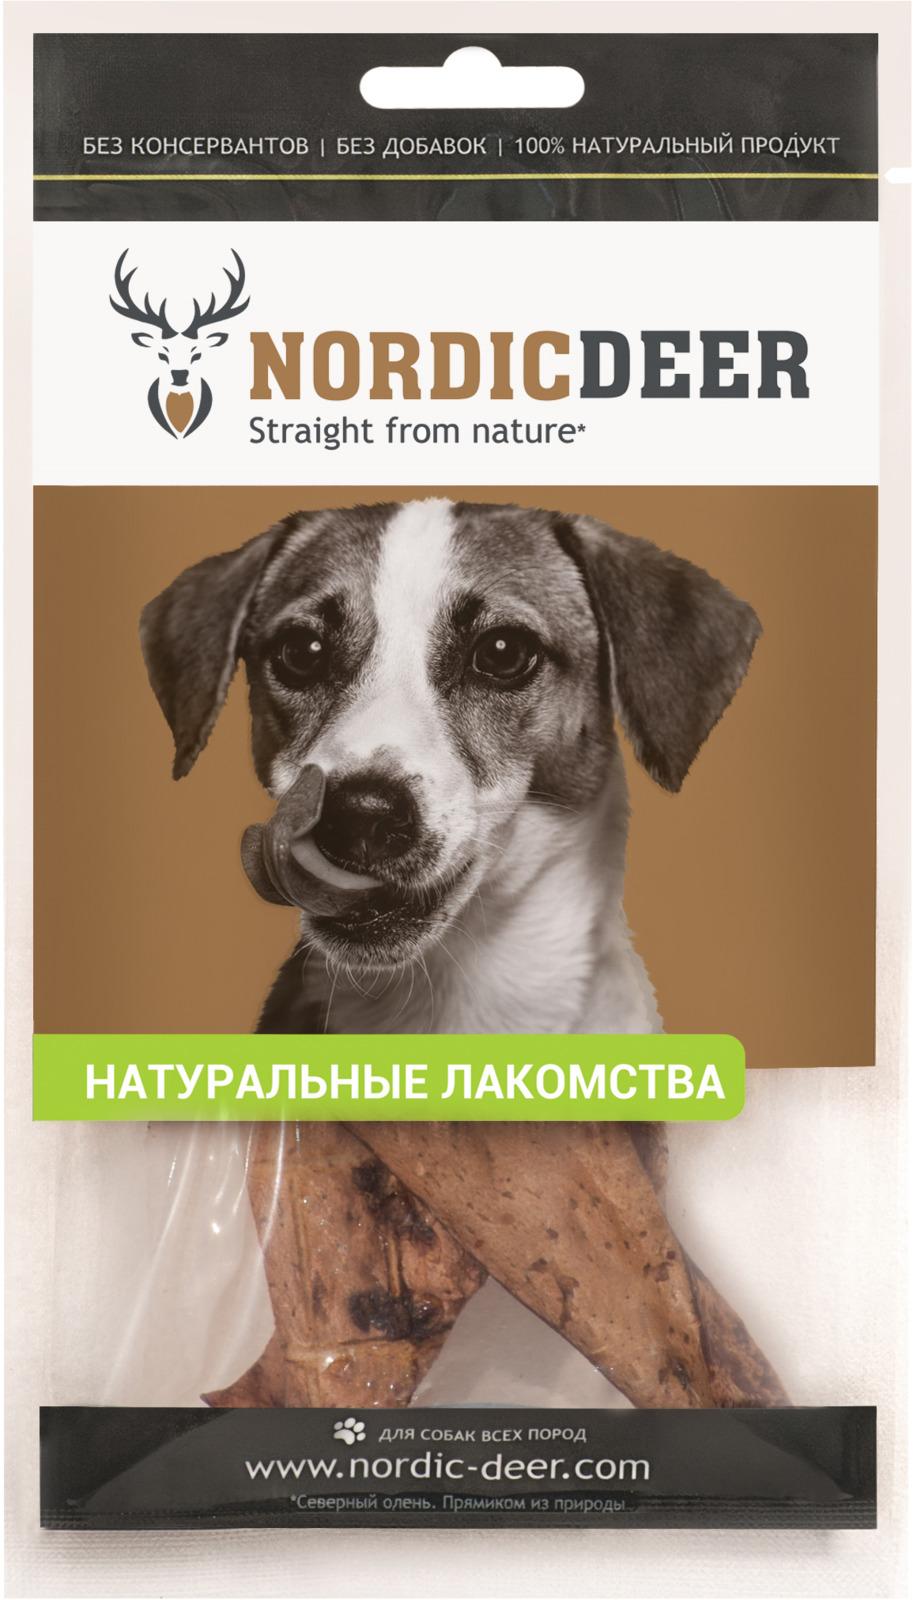 Лакомство для собак Nordic Deer Легкое баранина, 30 г nordic modern living room bedroom background simple english deer head decorative